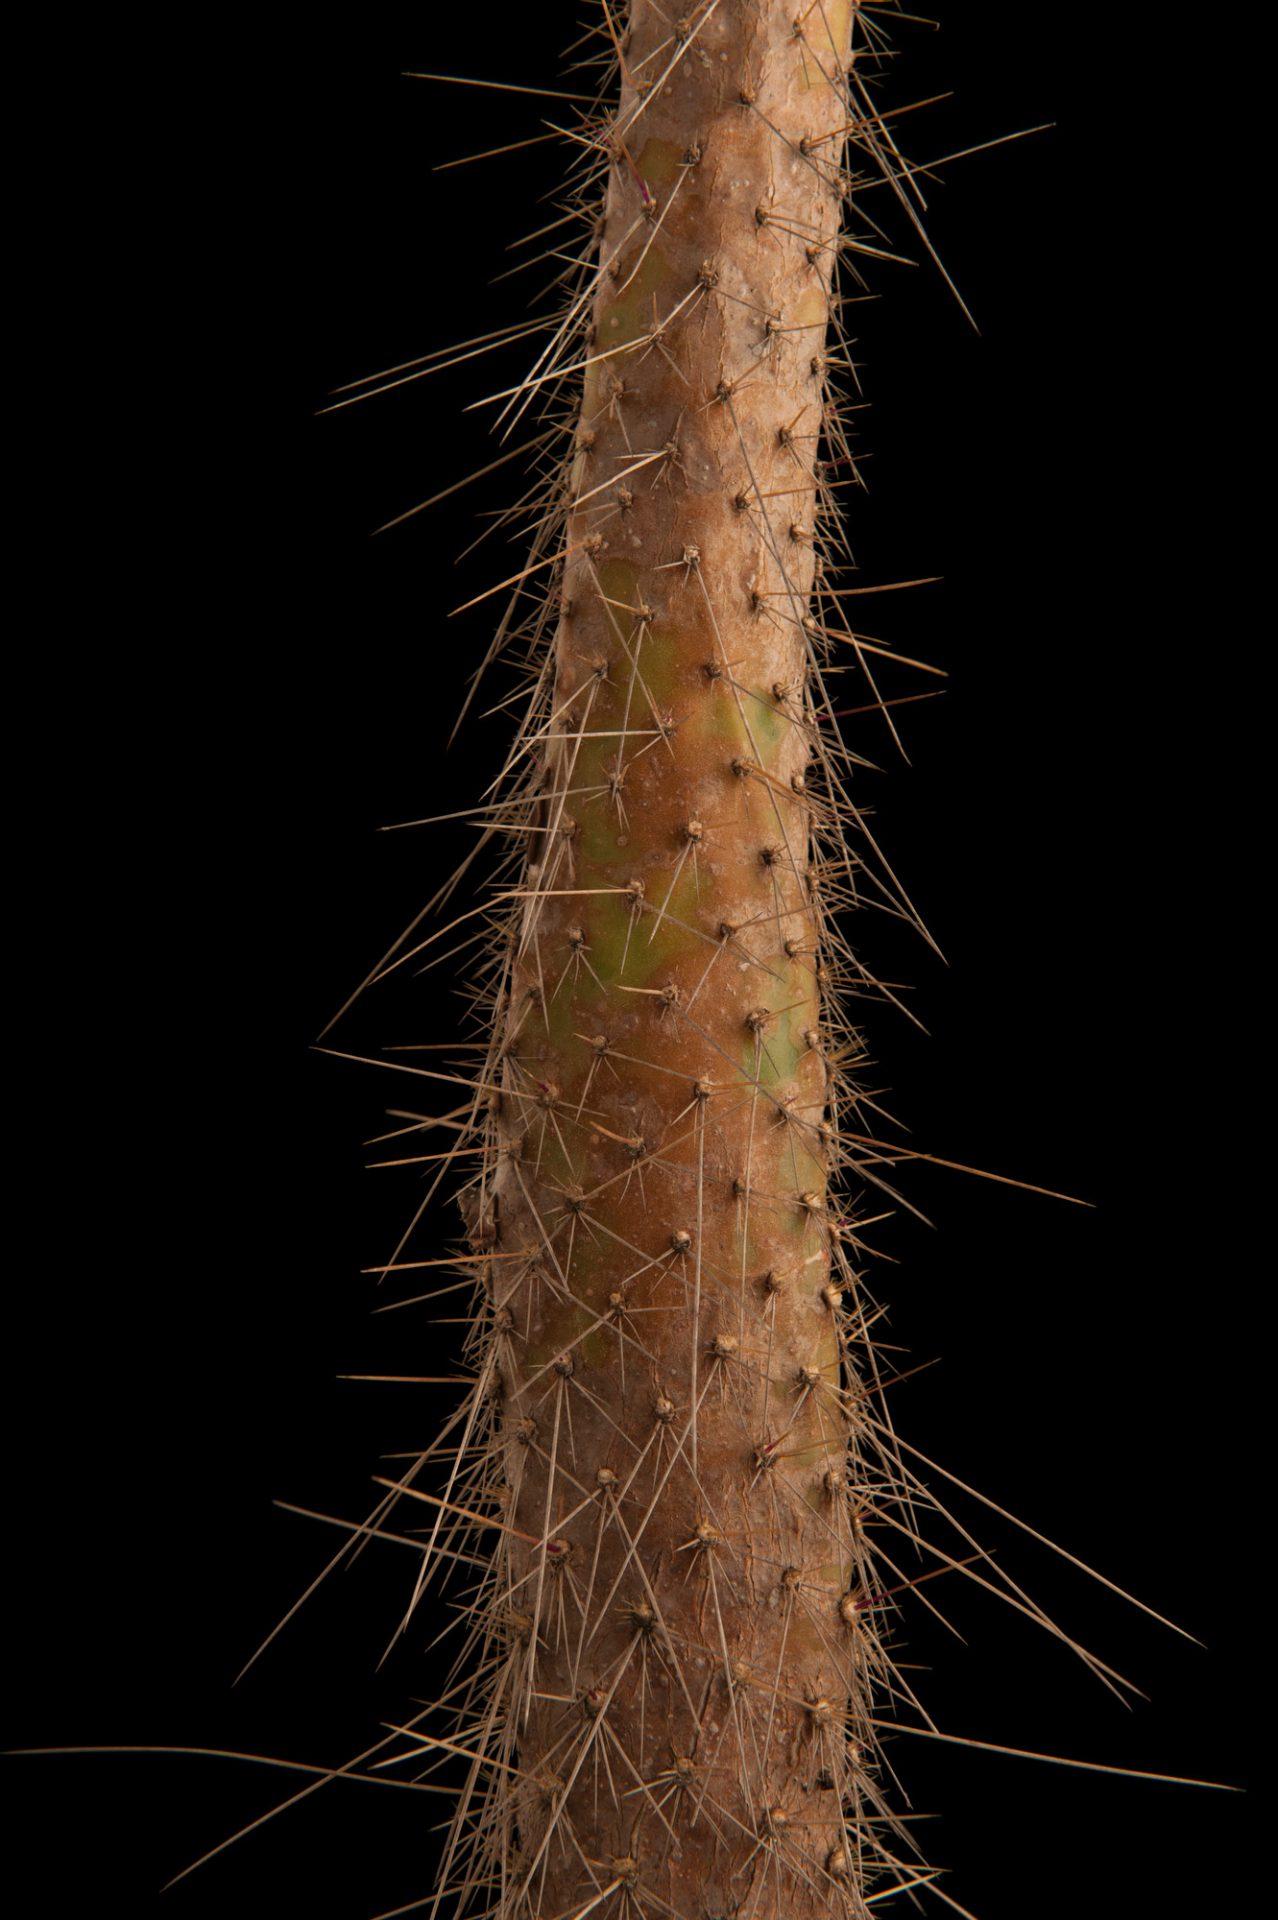 Photo: A semaphore cactus, Opuntia leucotricha, a federally-endangered plant species.